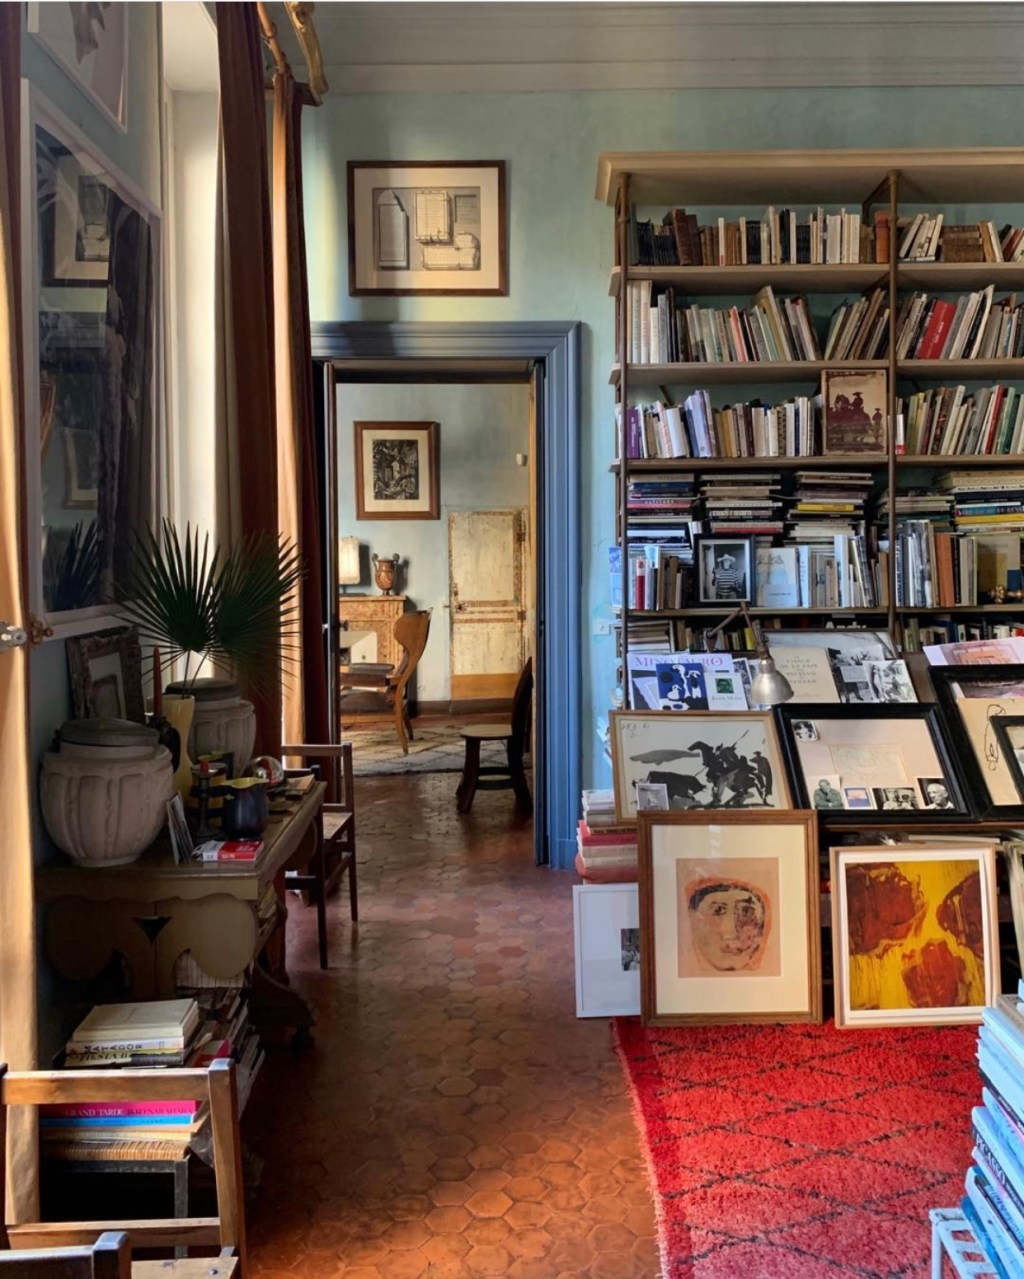 Francois Halard at Home, Arles: 56 Days in Arles